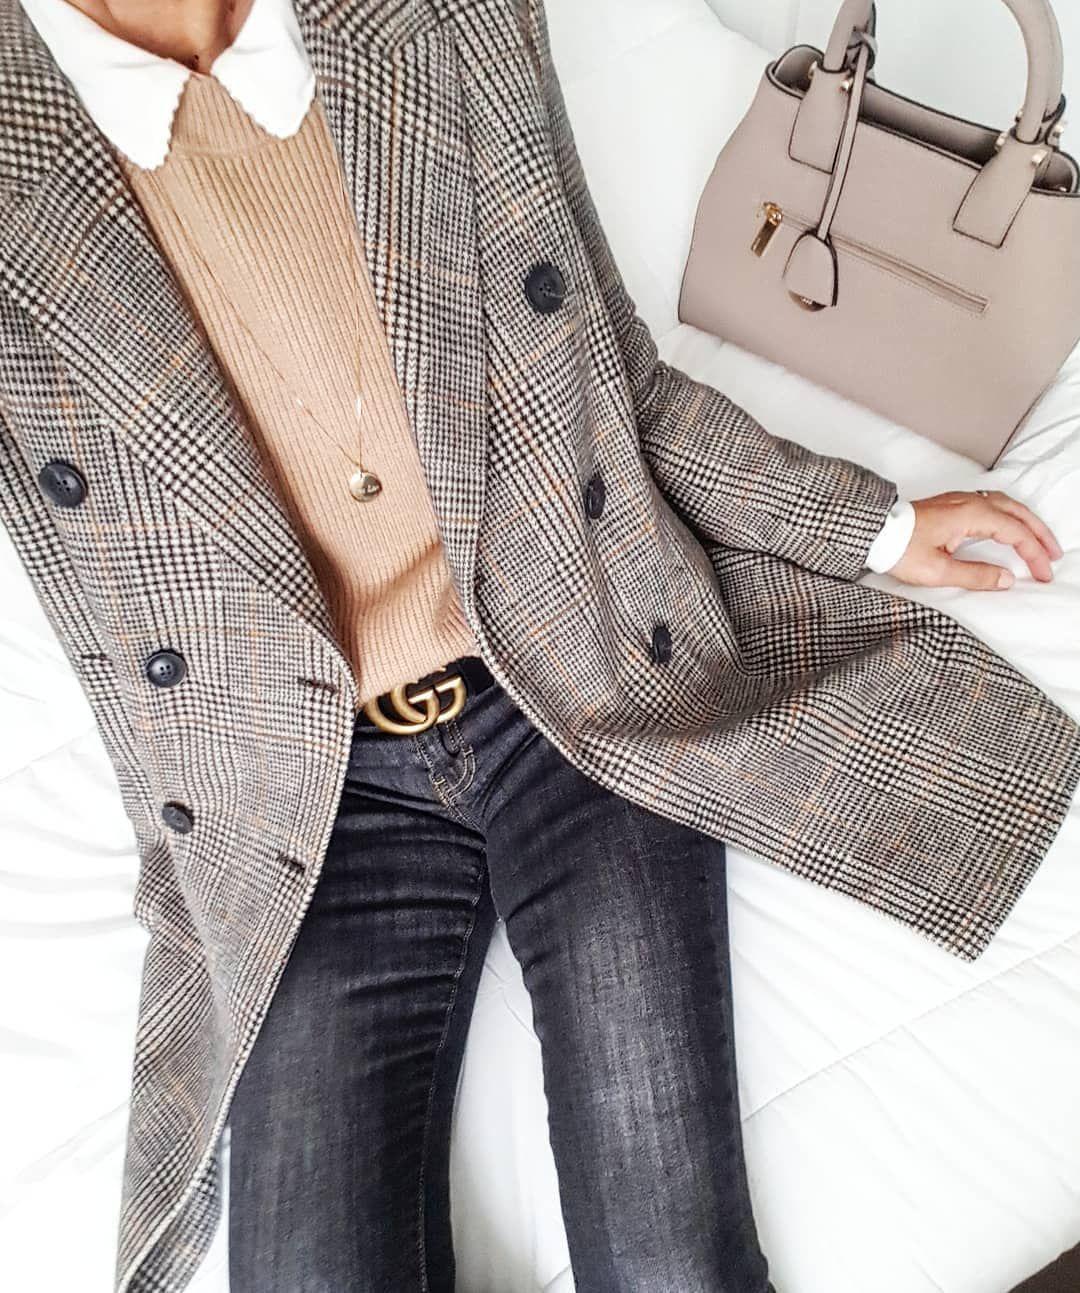 "M a r i e l l e on Instagram: ""Détails tenue du jour et du manteau @zara réf 7886/812 #outfit #ootd #tenuedujour #mode #fashion #fashionstyle #casual #blogmode #tendance…"" 1"